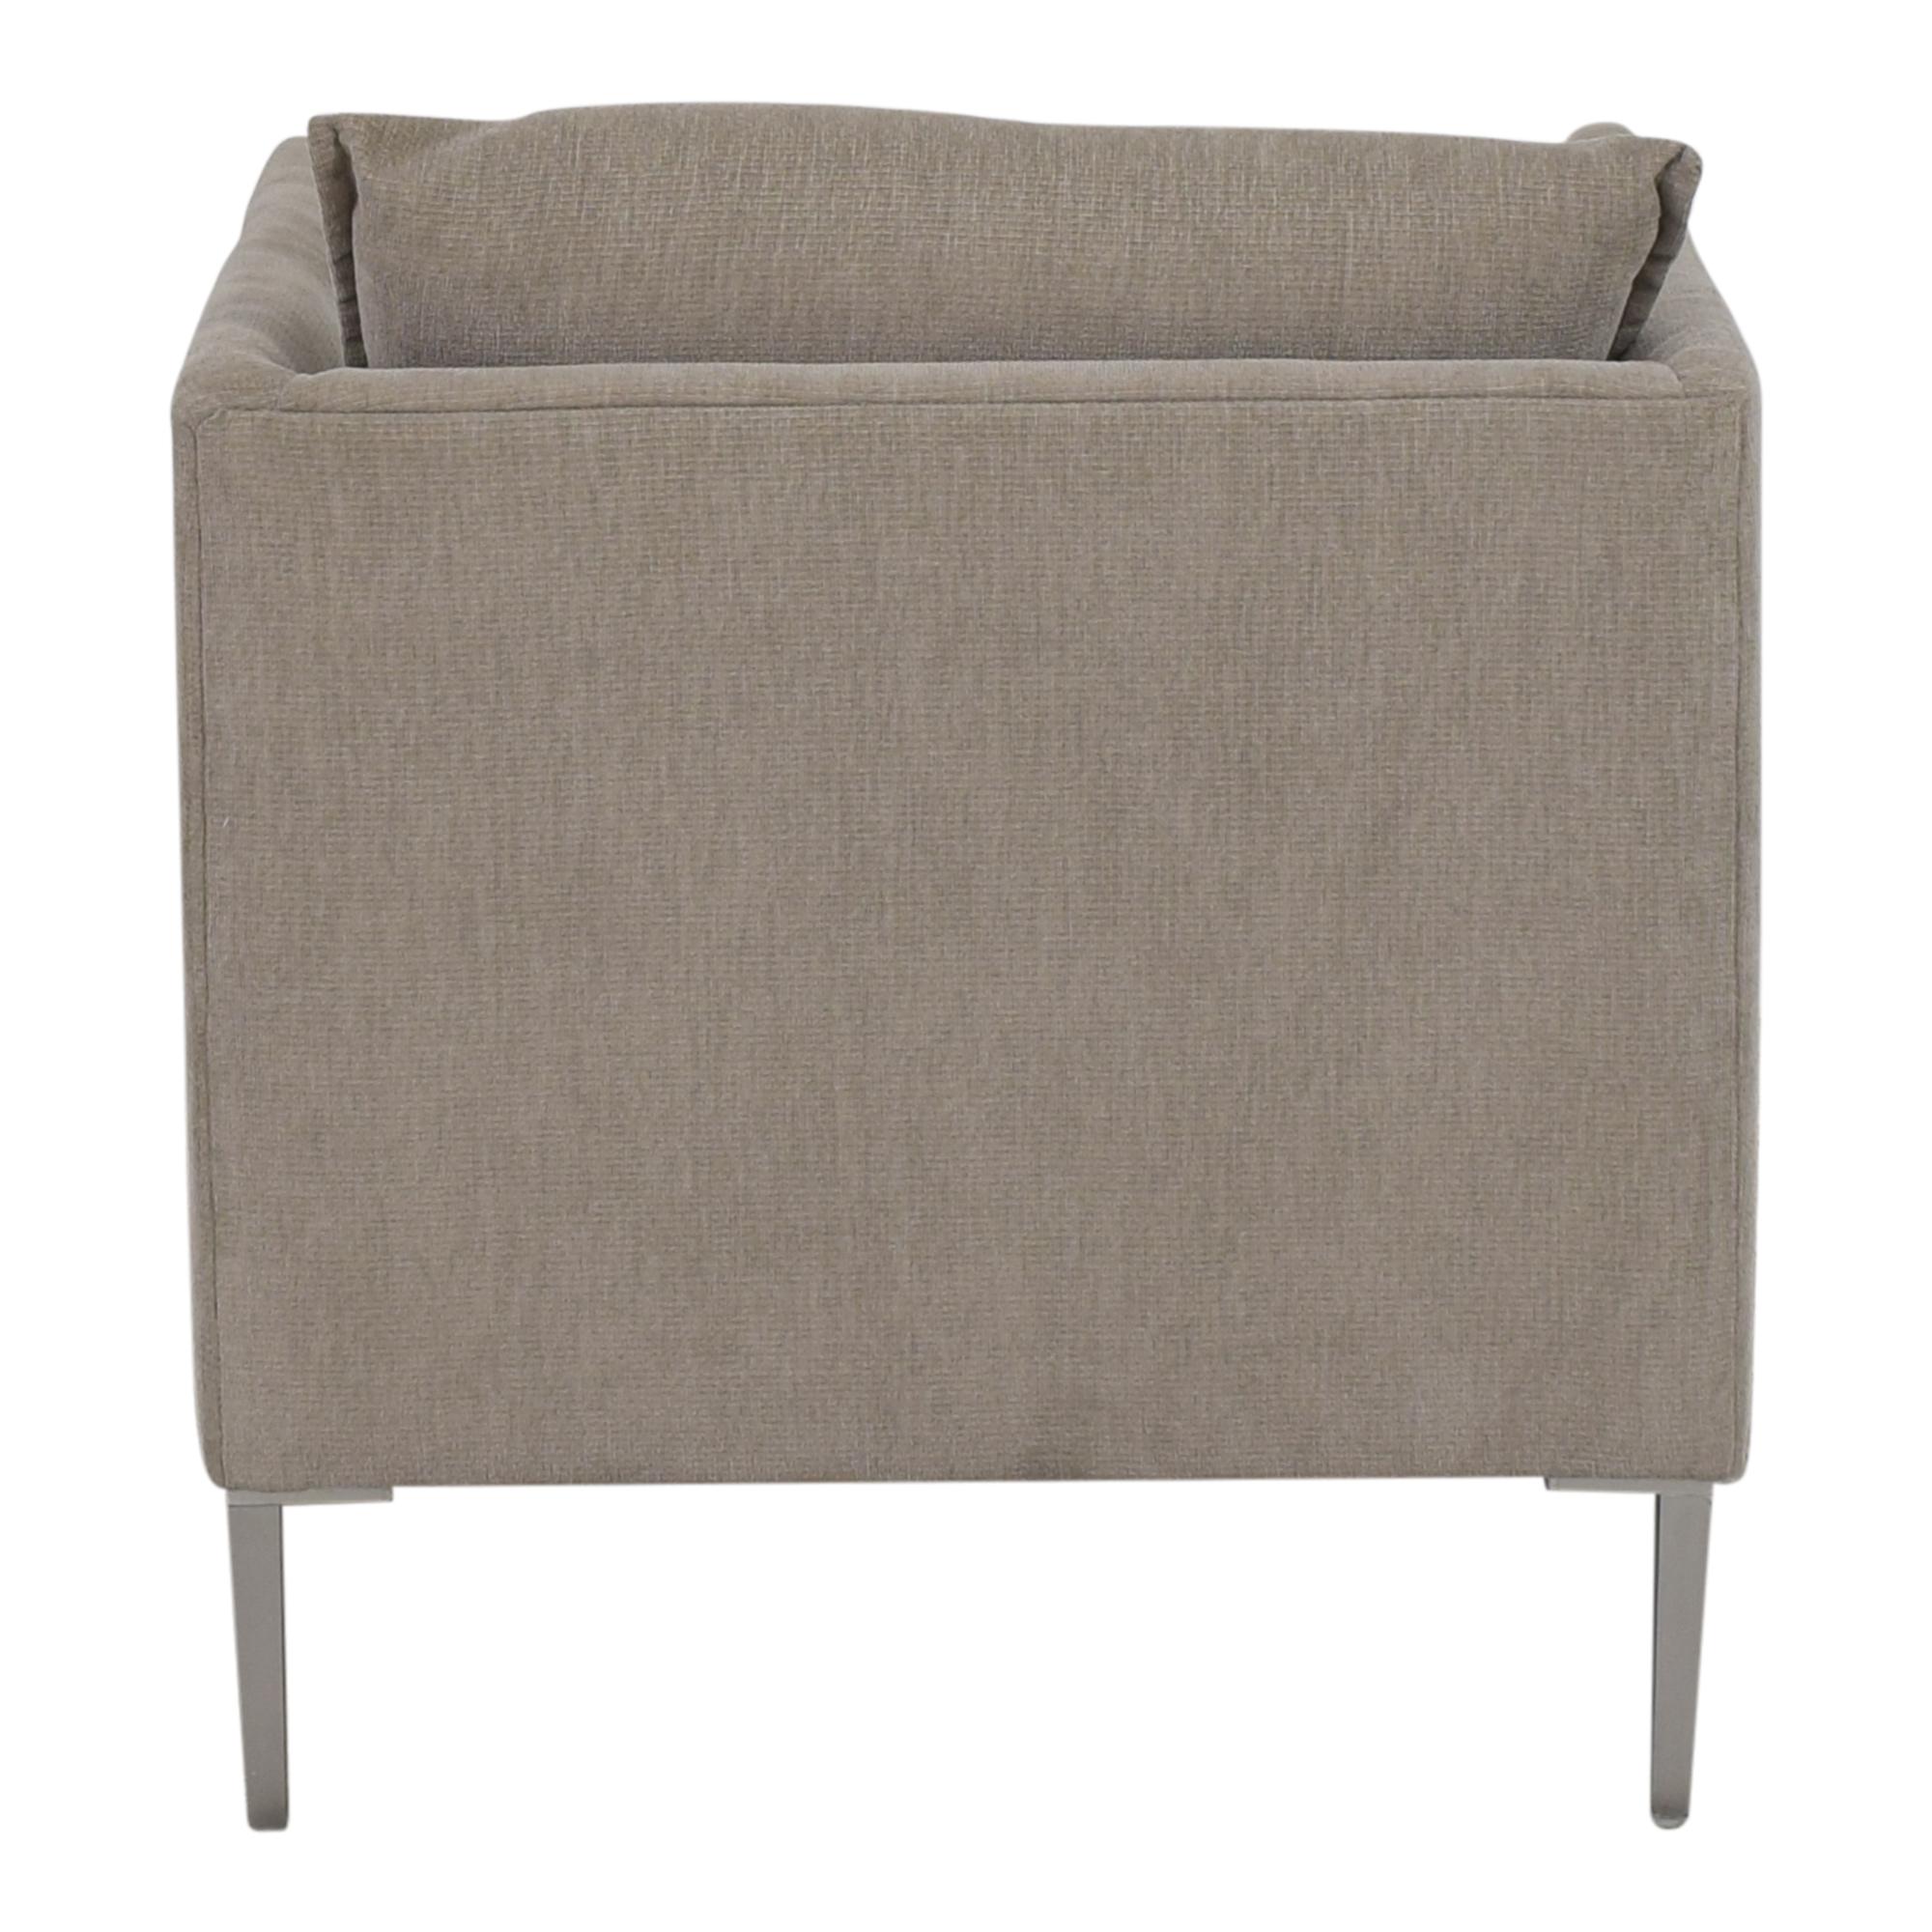 Room & Board Room & Board Vela Chair